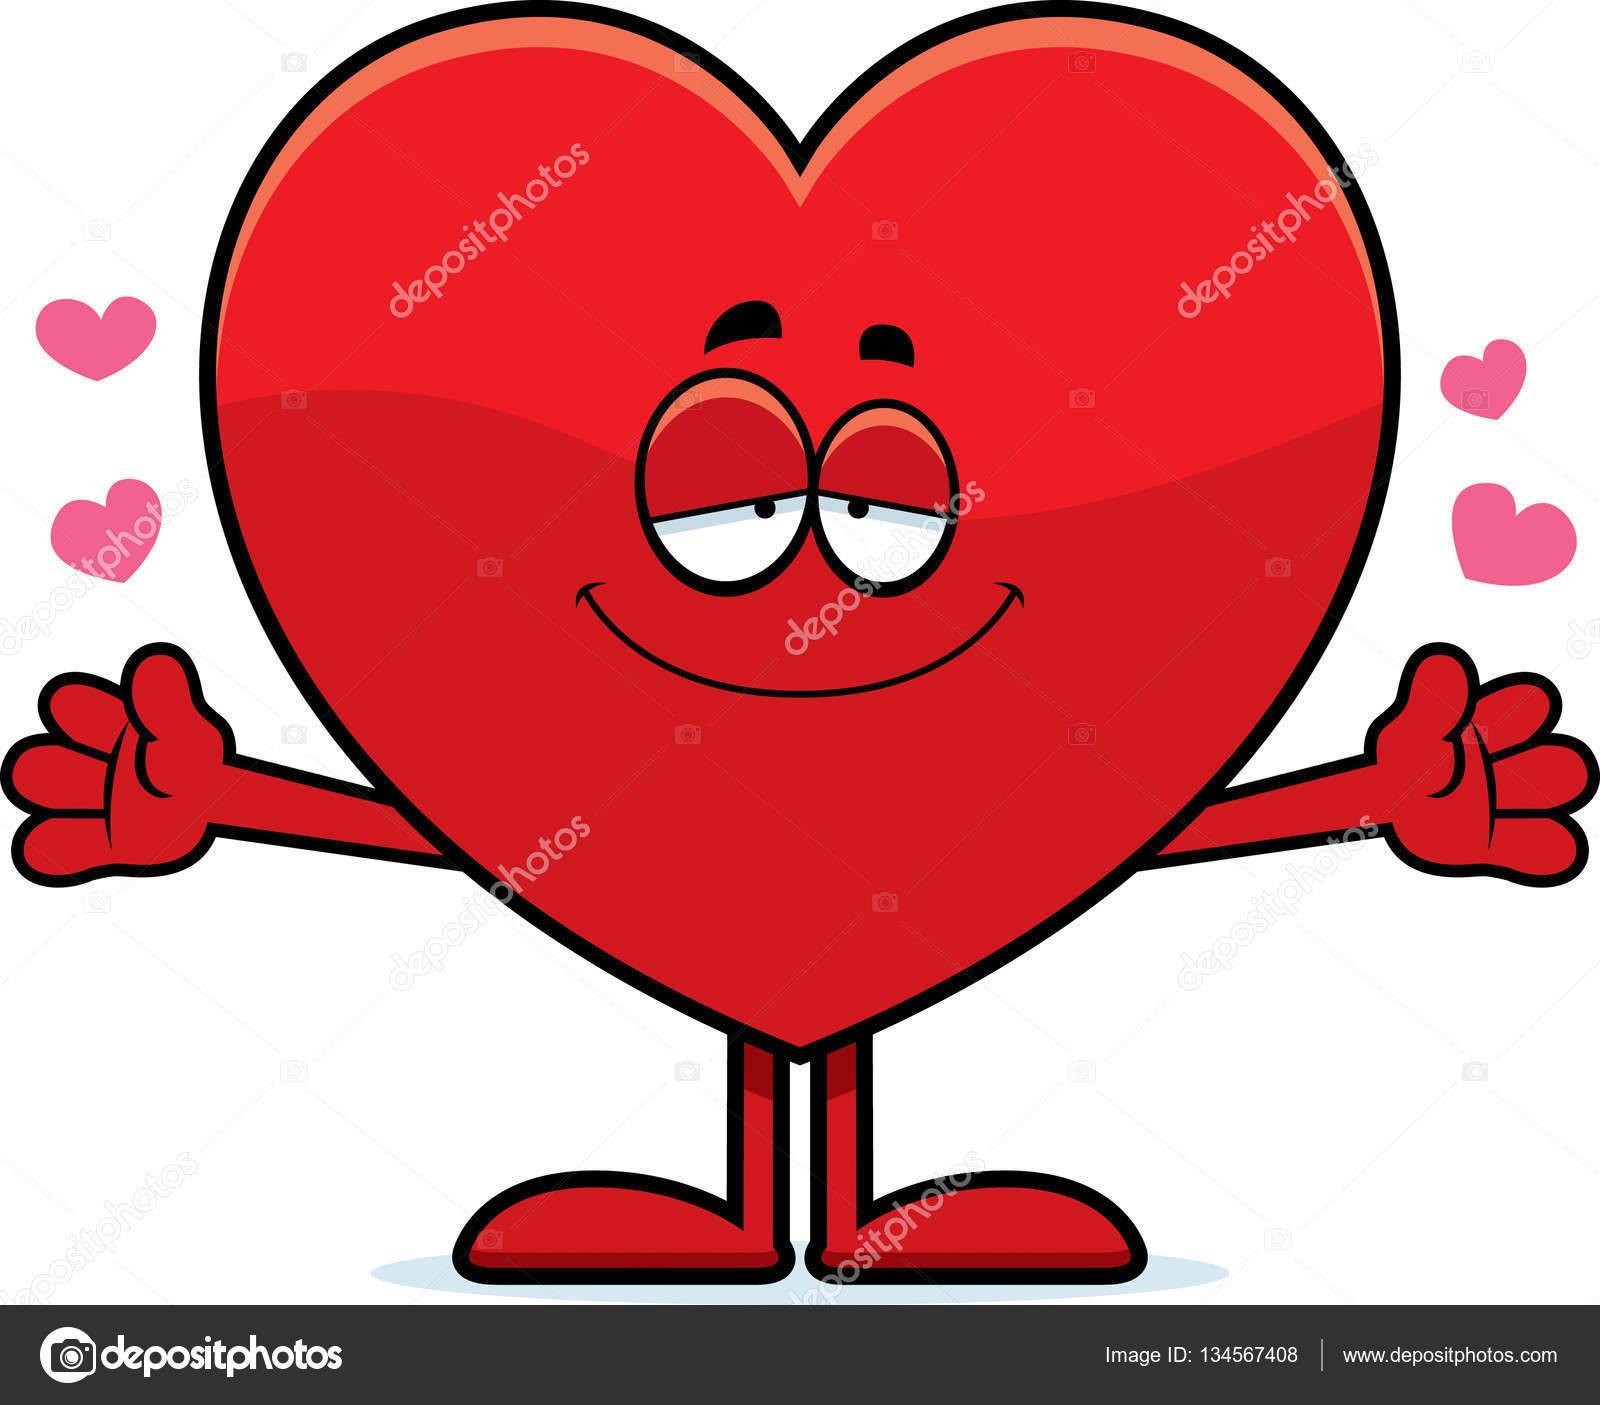 Coeur Dessin câlin cœur dessin animé — image vectorielle cthoman © #134567408